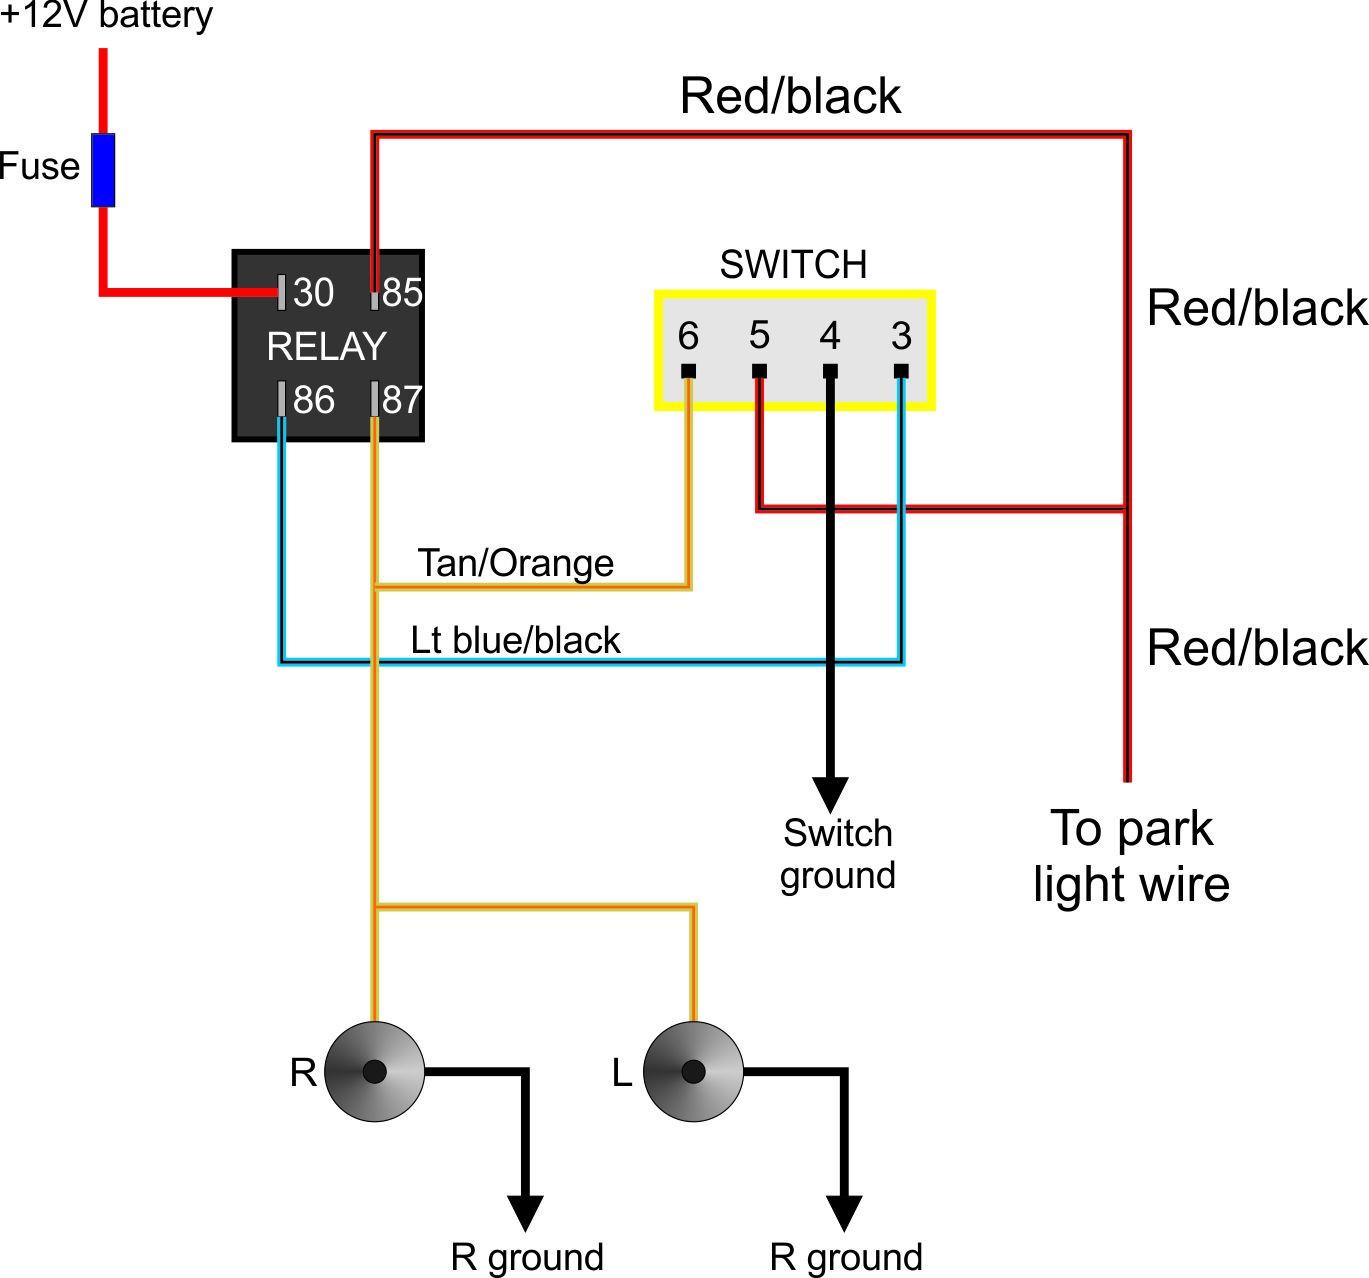 fog lights wiring diagram hg 3409  com fog light wiring diagram for 2006 chevy silverado  hg 3409  com fog light wiring diagram